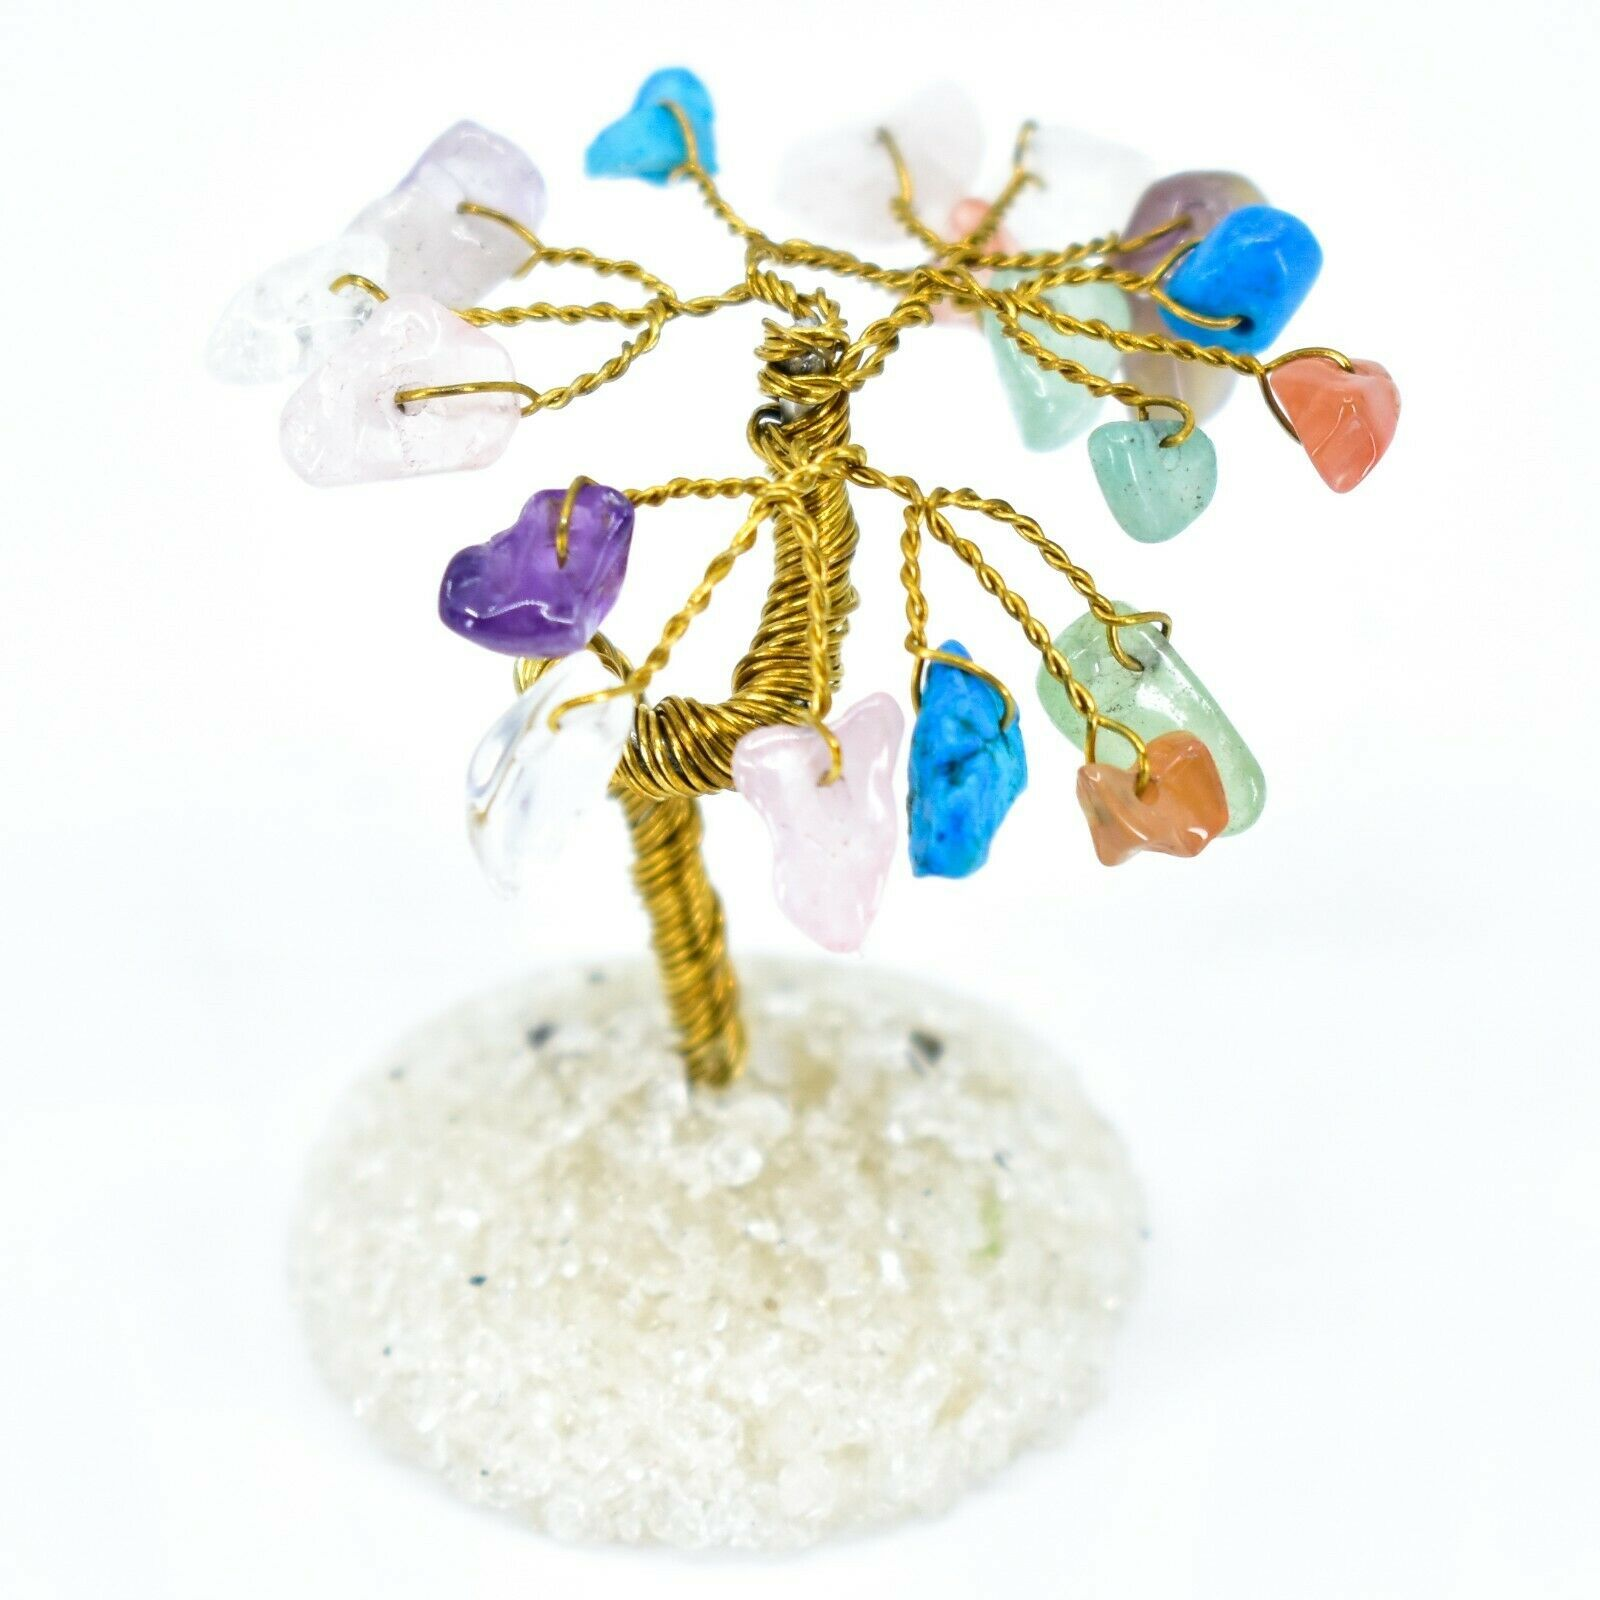 Mixed Polished Gemstone Colorful Variety Miniature Gem Tree Mini Gemtree